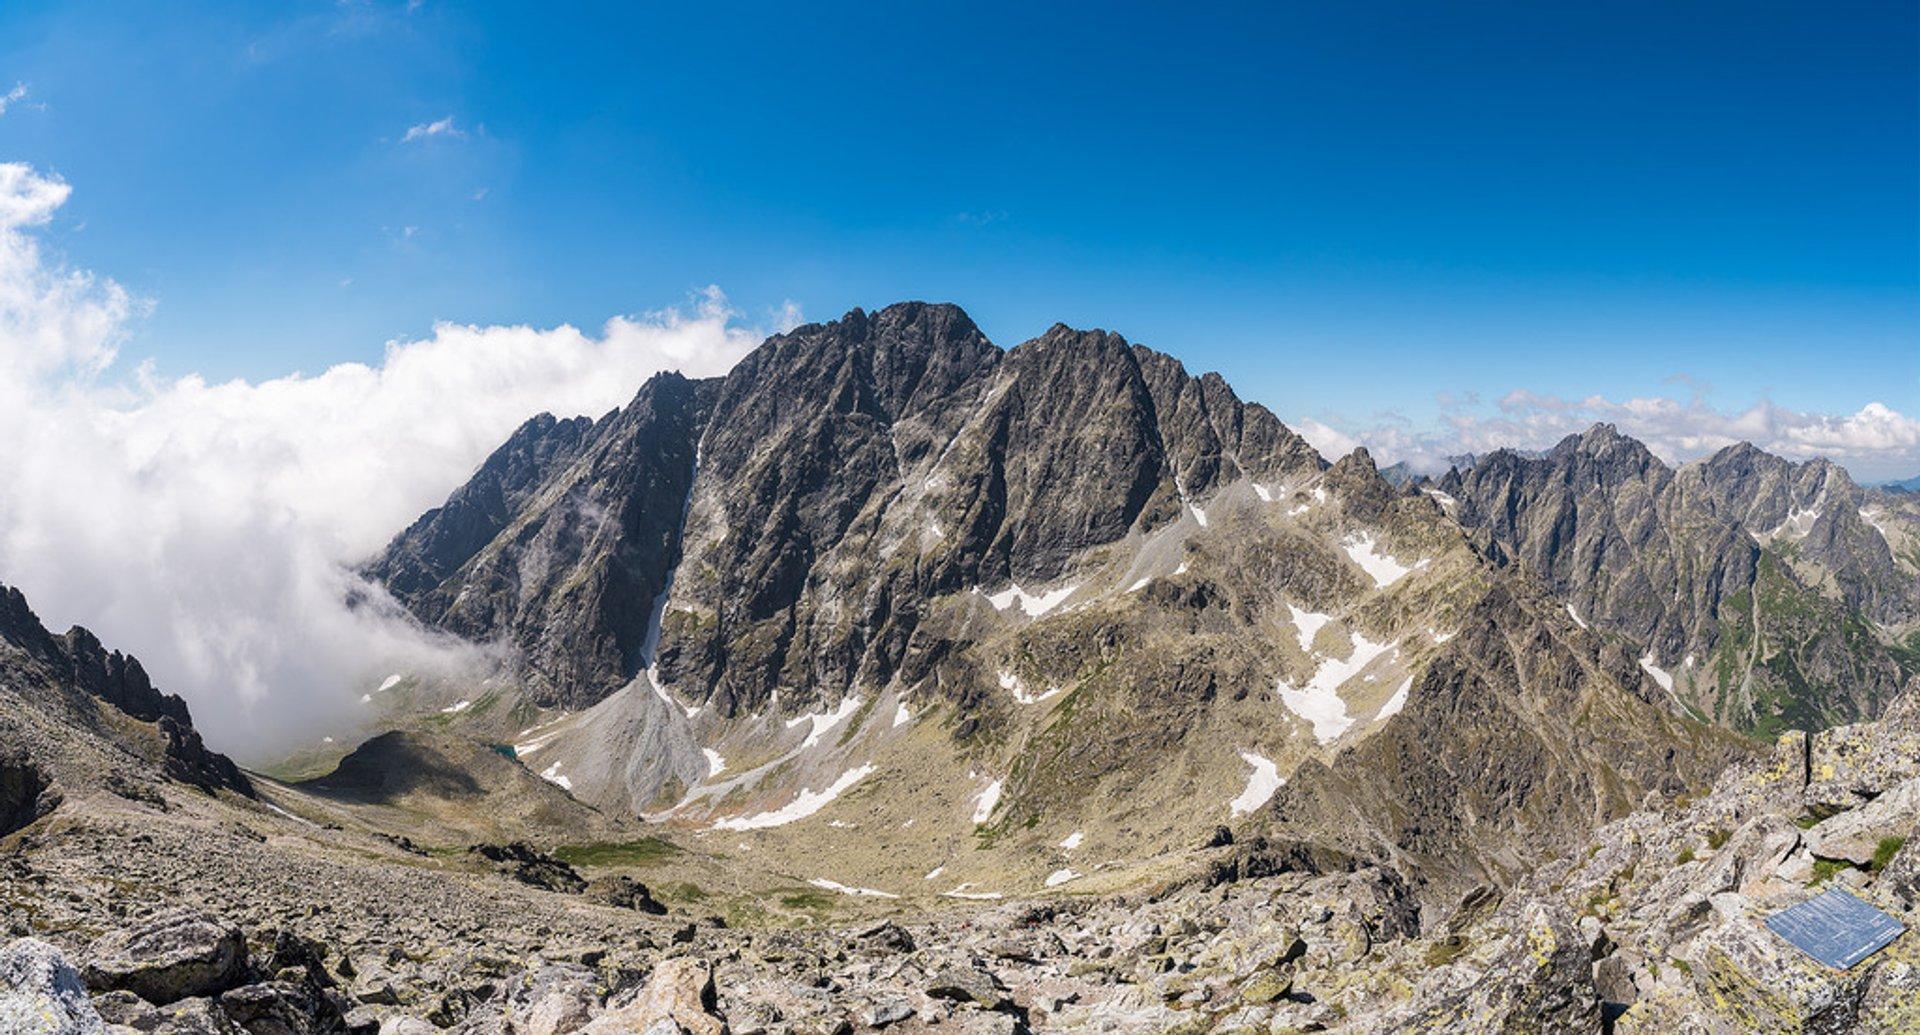 Climbing Gerlachovský Štít in Slovakia 2019 - Best Time